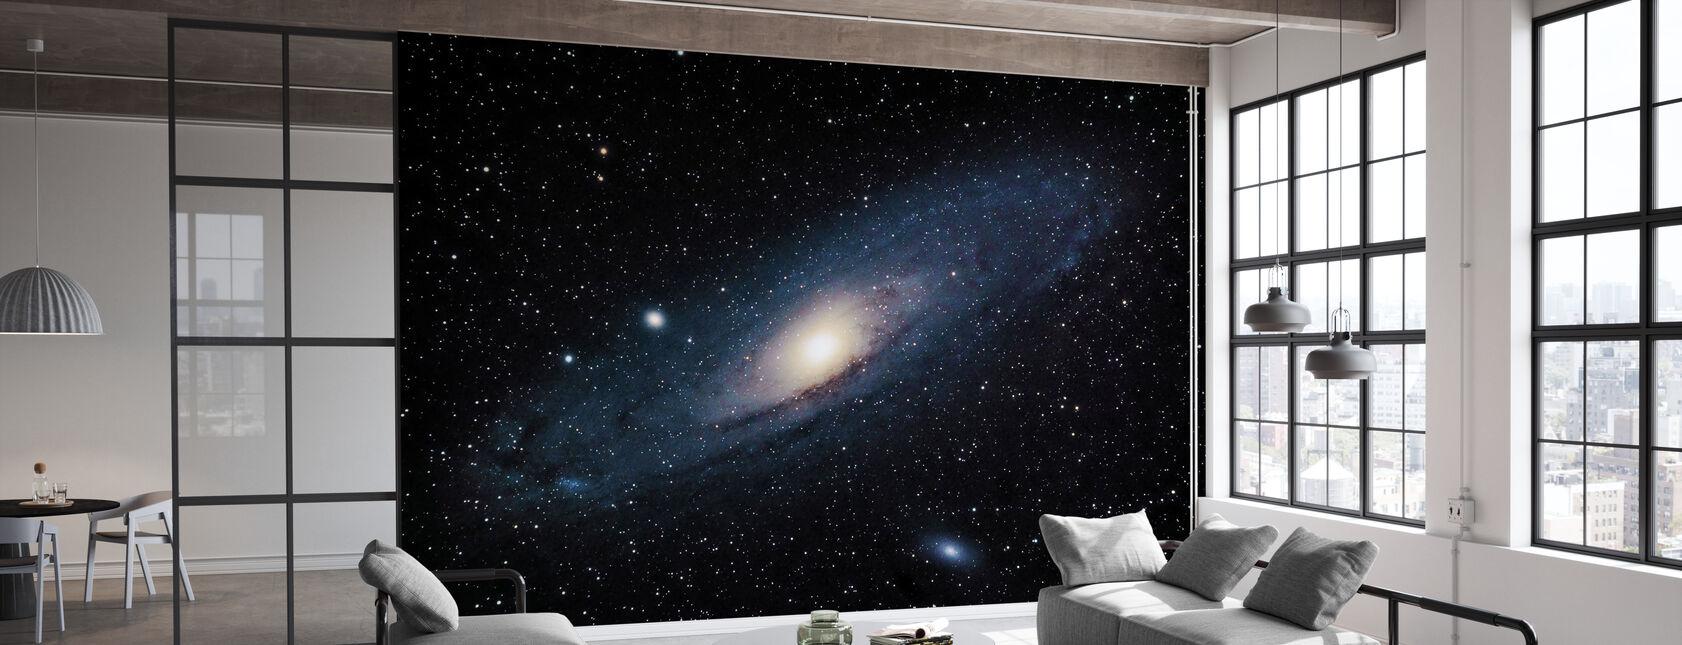 Andromeda Galaxy - Tapetti - Toimisto